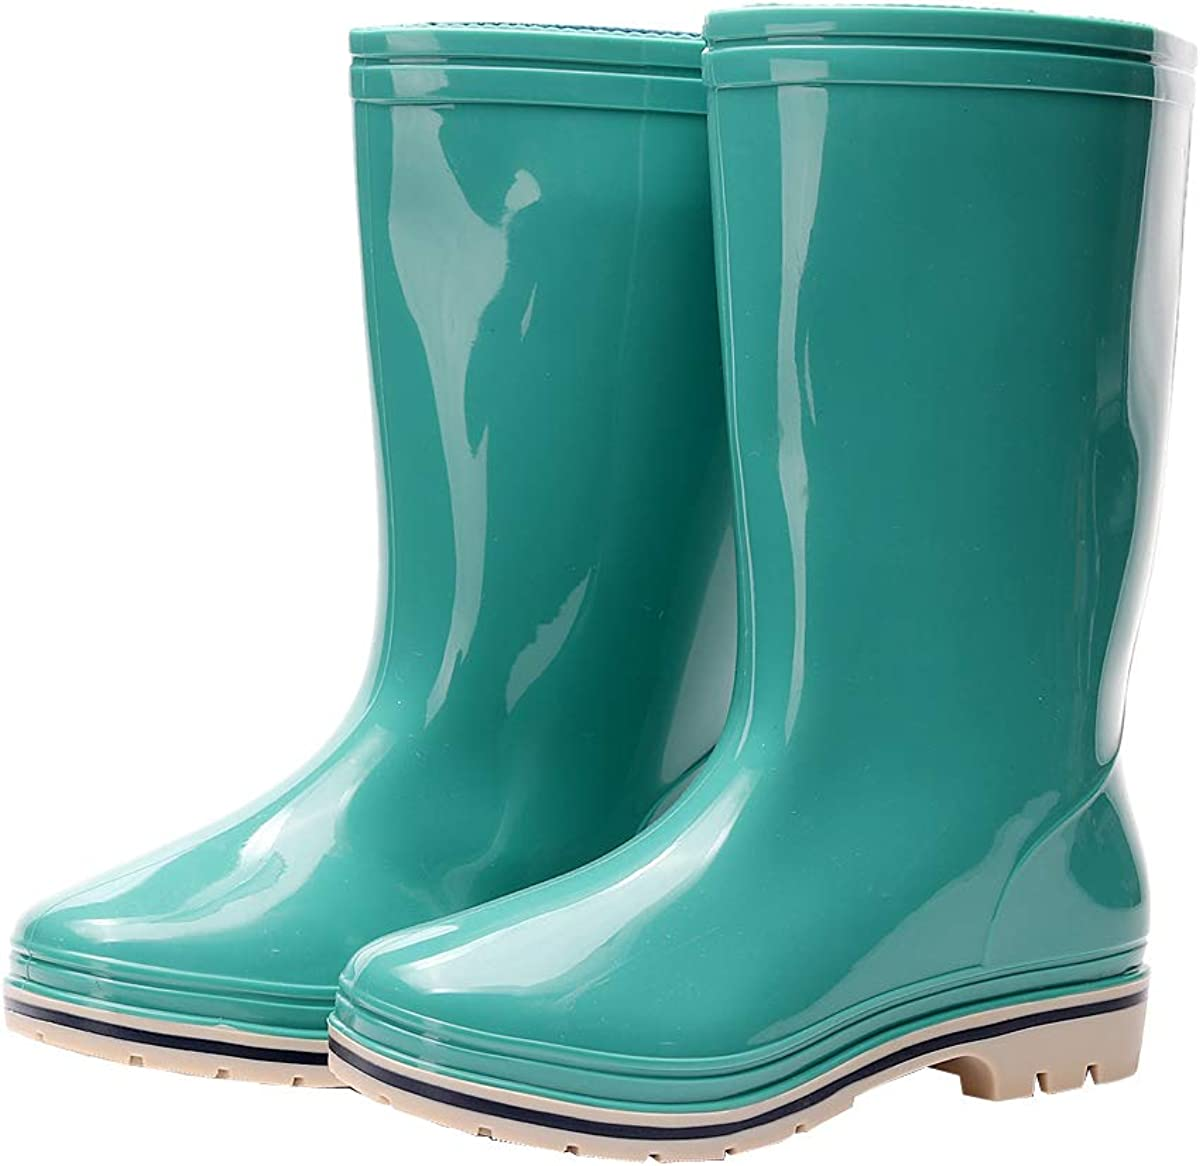 Kontai Womens Rain and Garden Boot Wellies Half Calf Rubber Waterproof for Garden Women rain Footwear